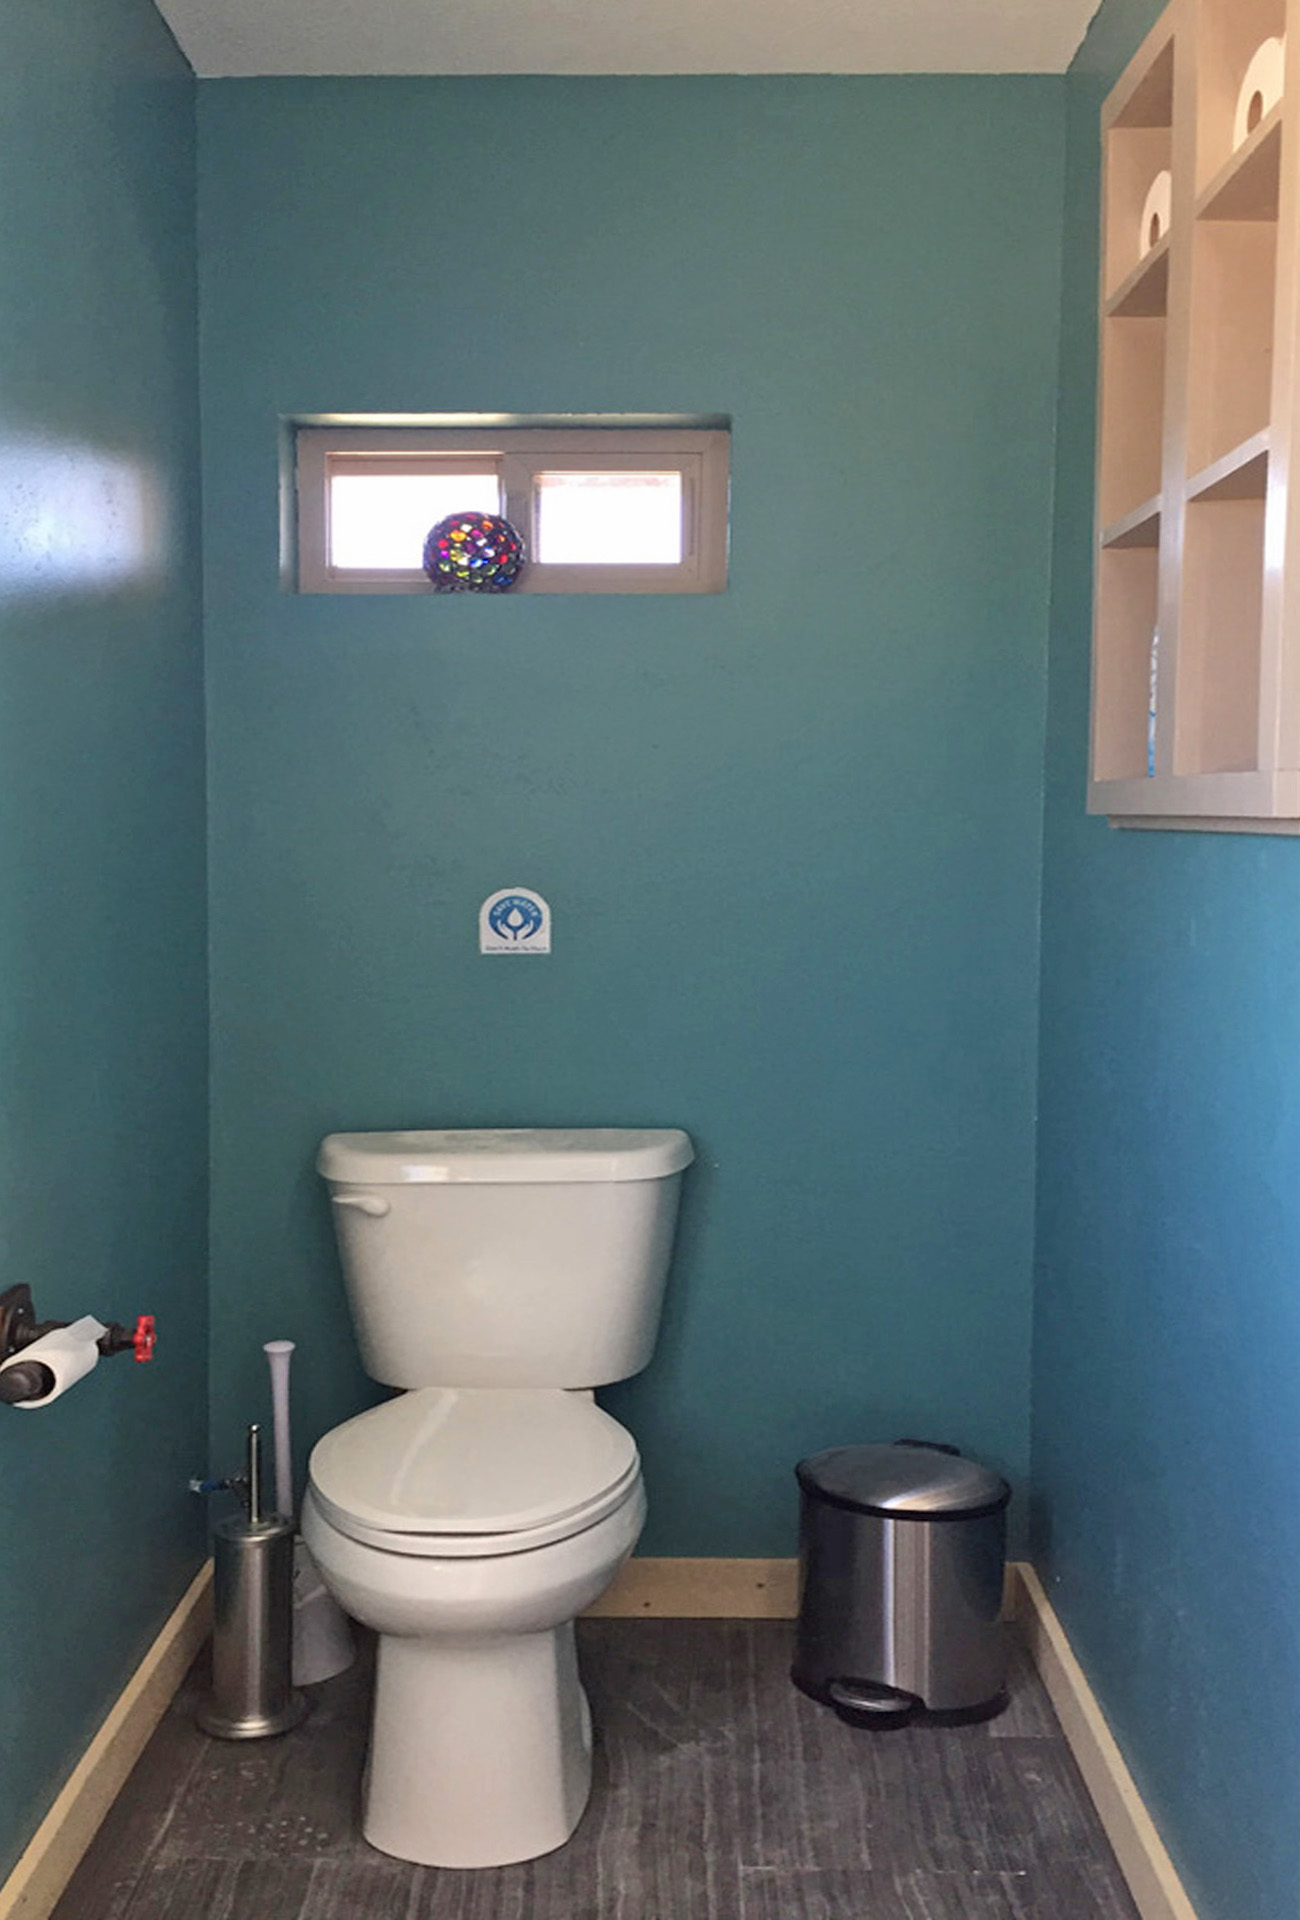 Bathroom Throne